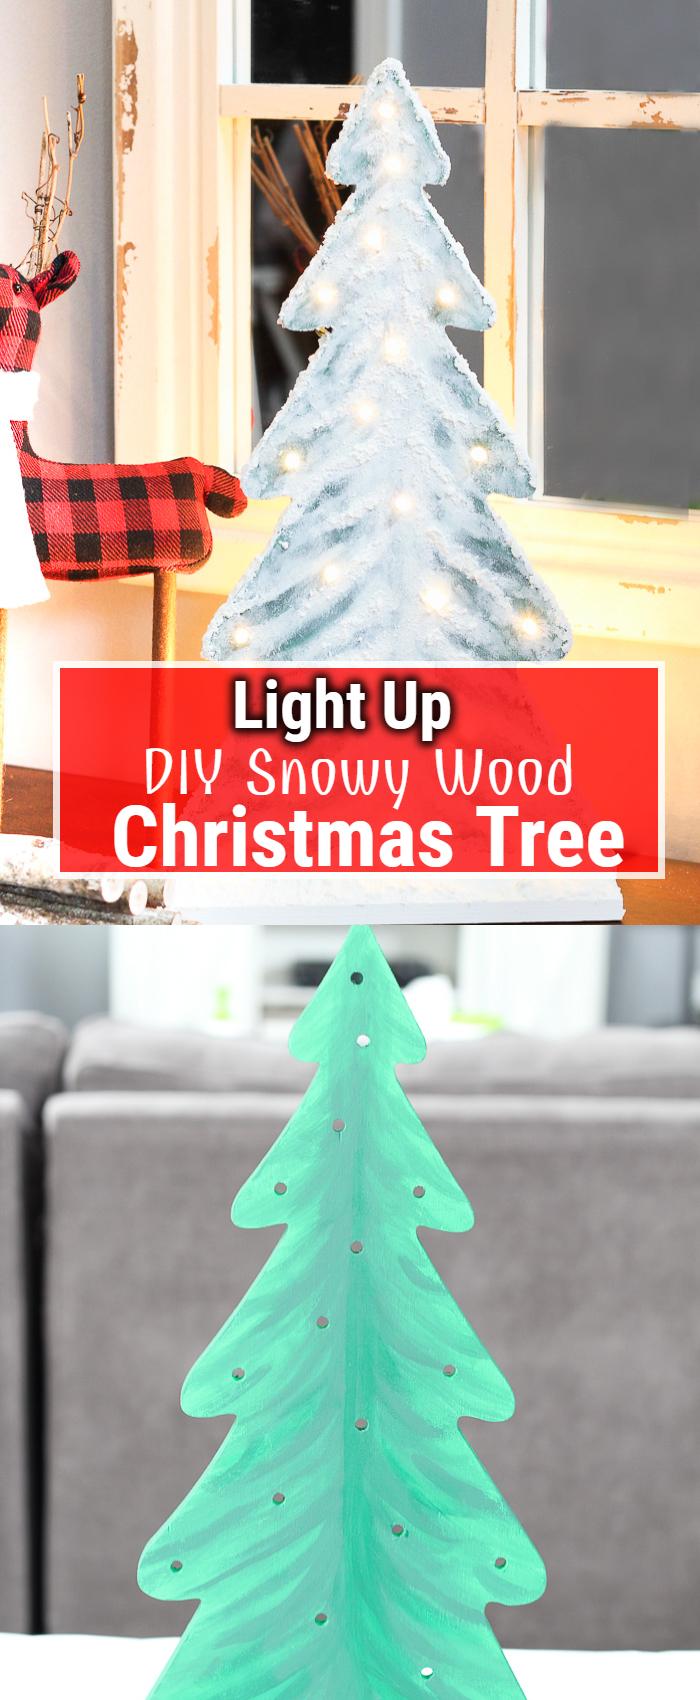 Light Up DIY Snowy Wood Christmas Tree